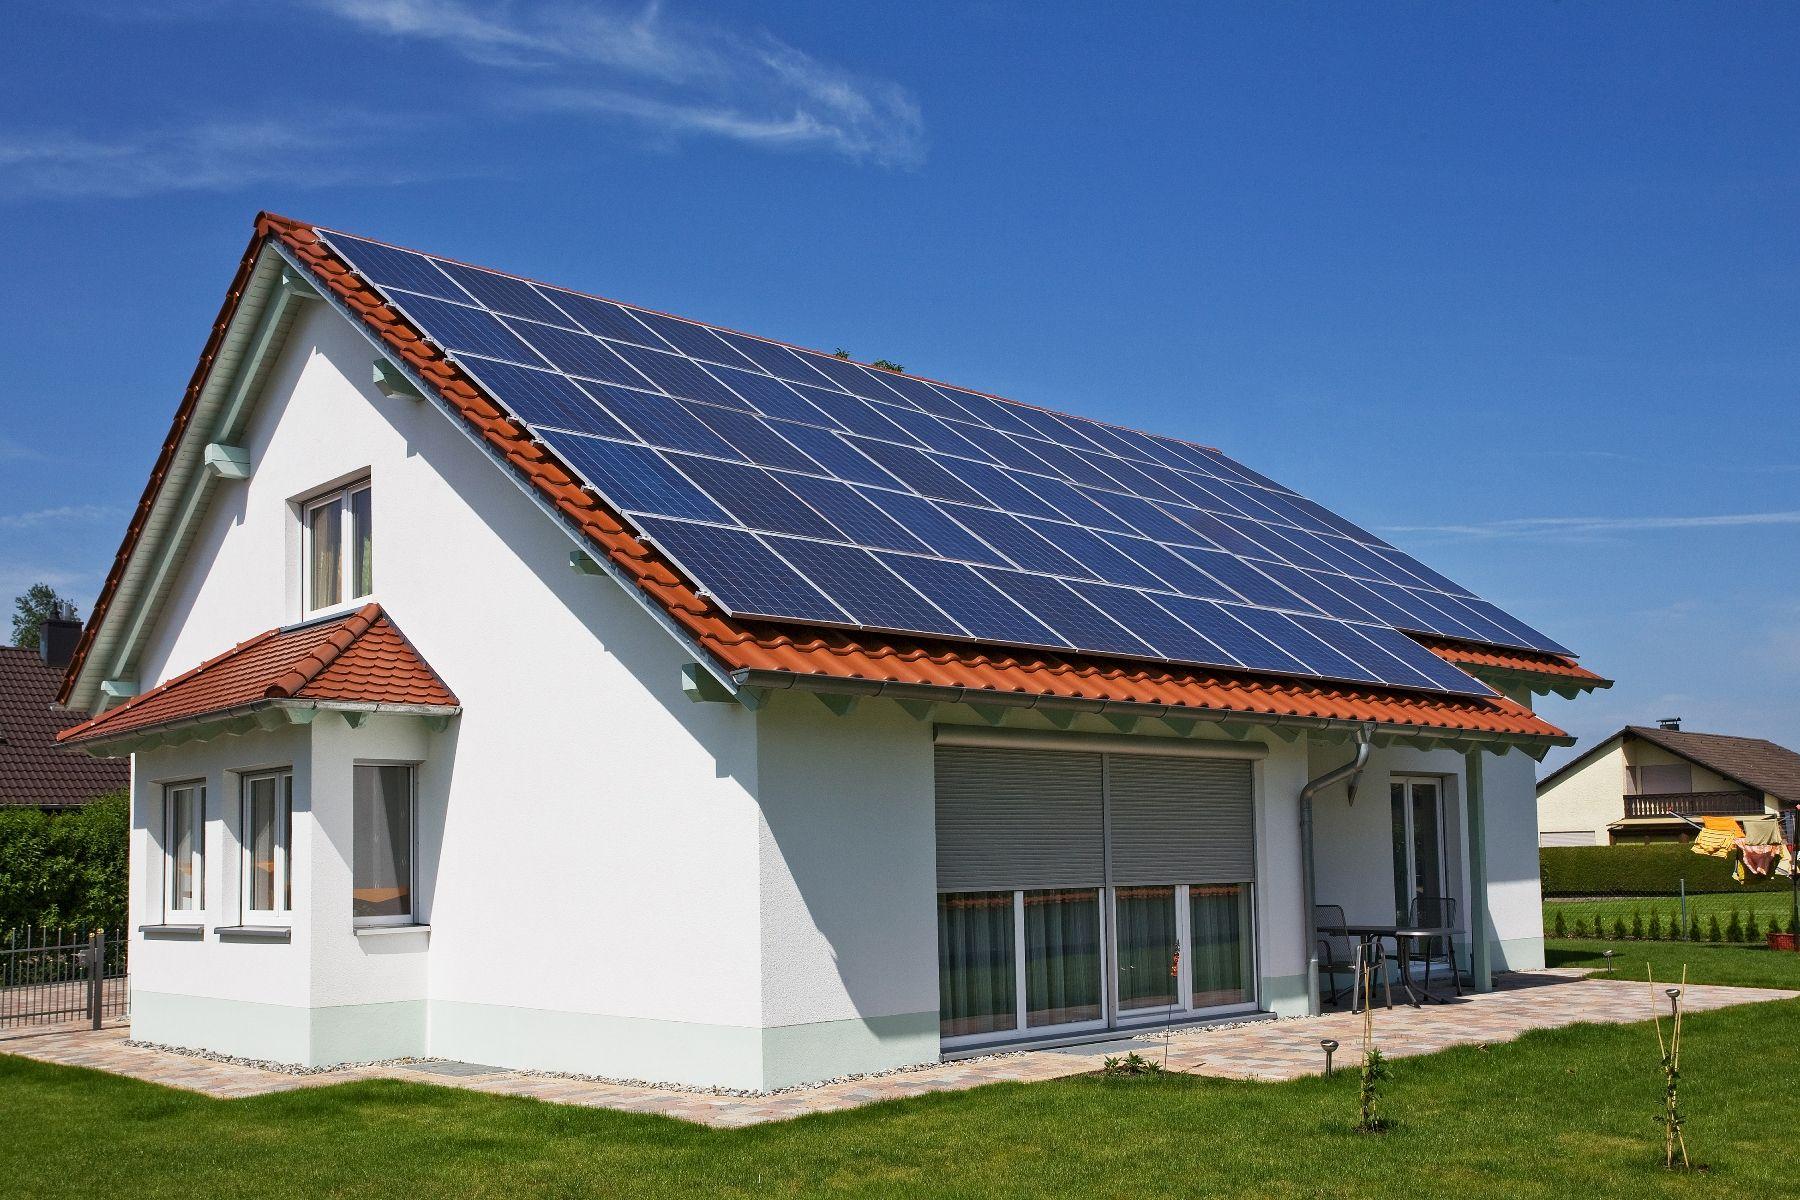 Como Funciona Un Sistema Fotovoltaico De Autoconsumo. Installing Your Own Solar  Energy ...